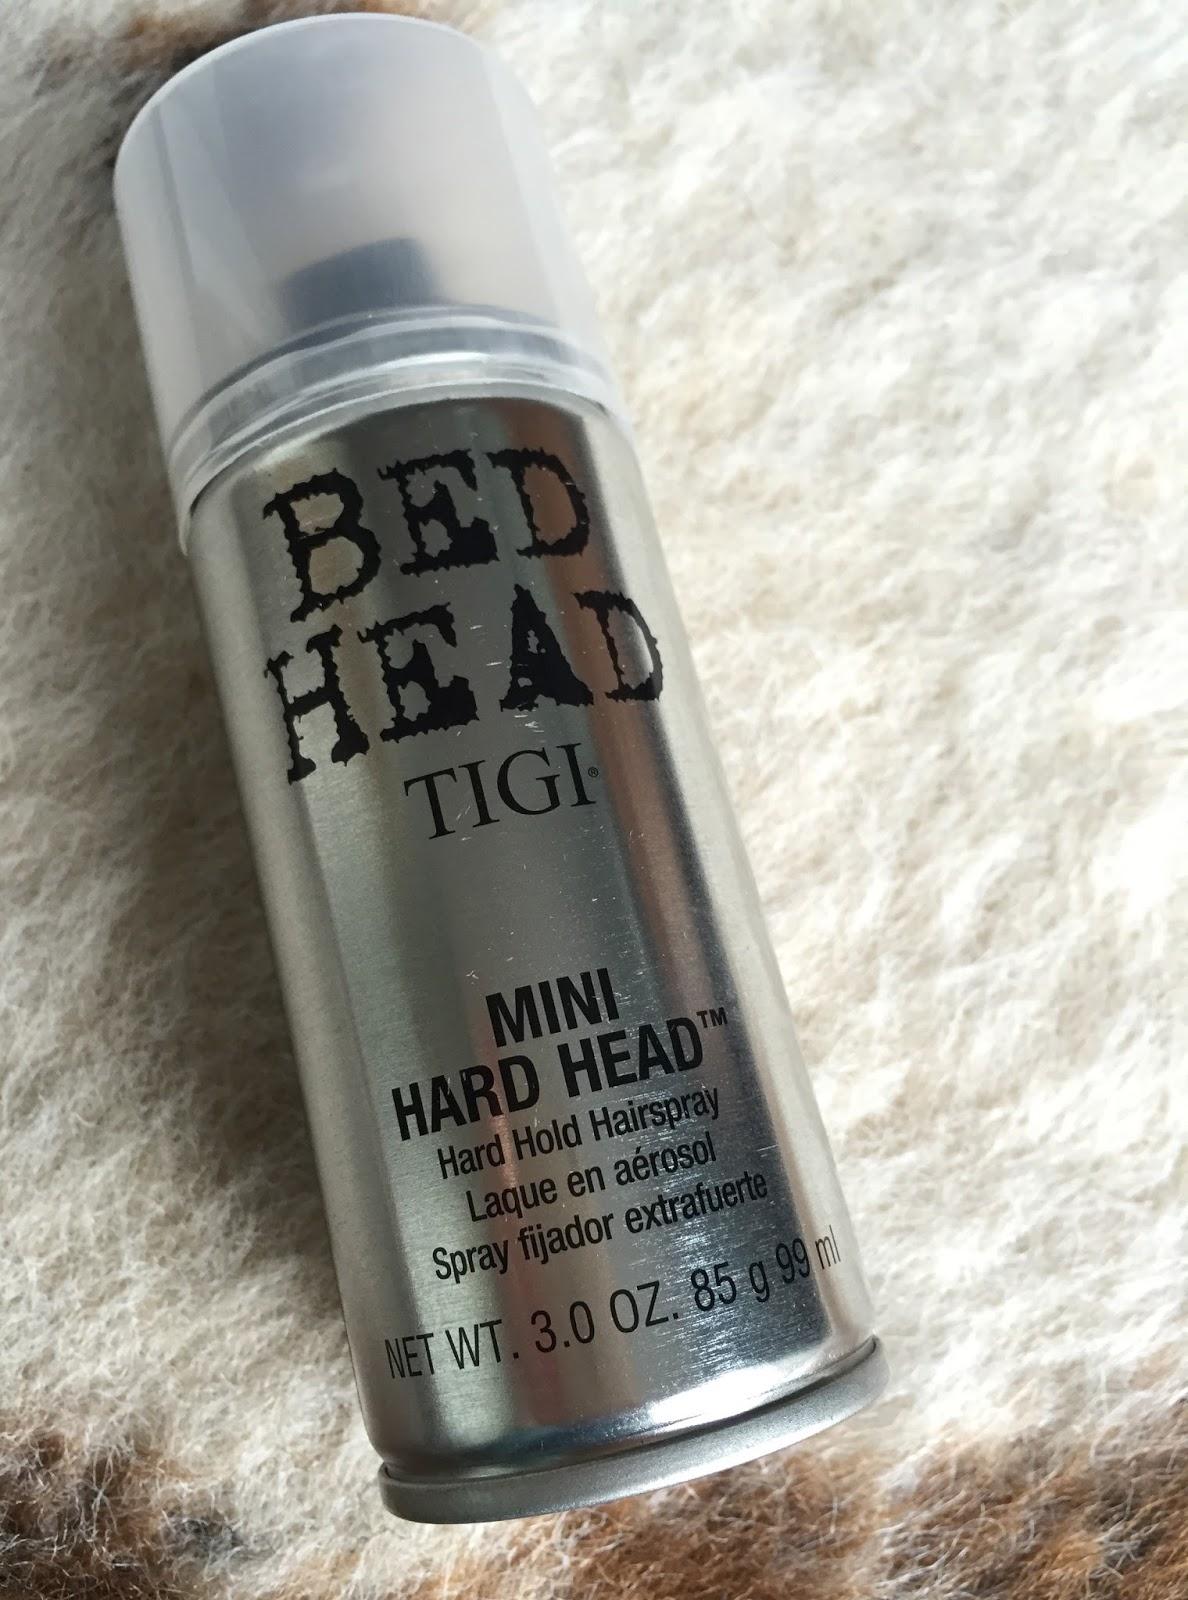 Kittykat Loves Makeup Tigi Bed Head Hard Head Hairspray Review